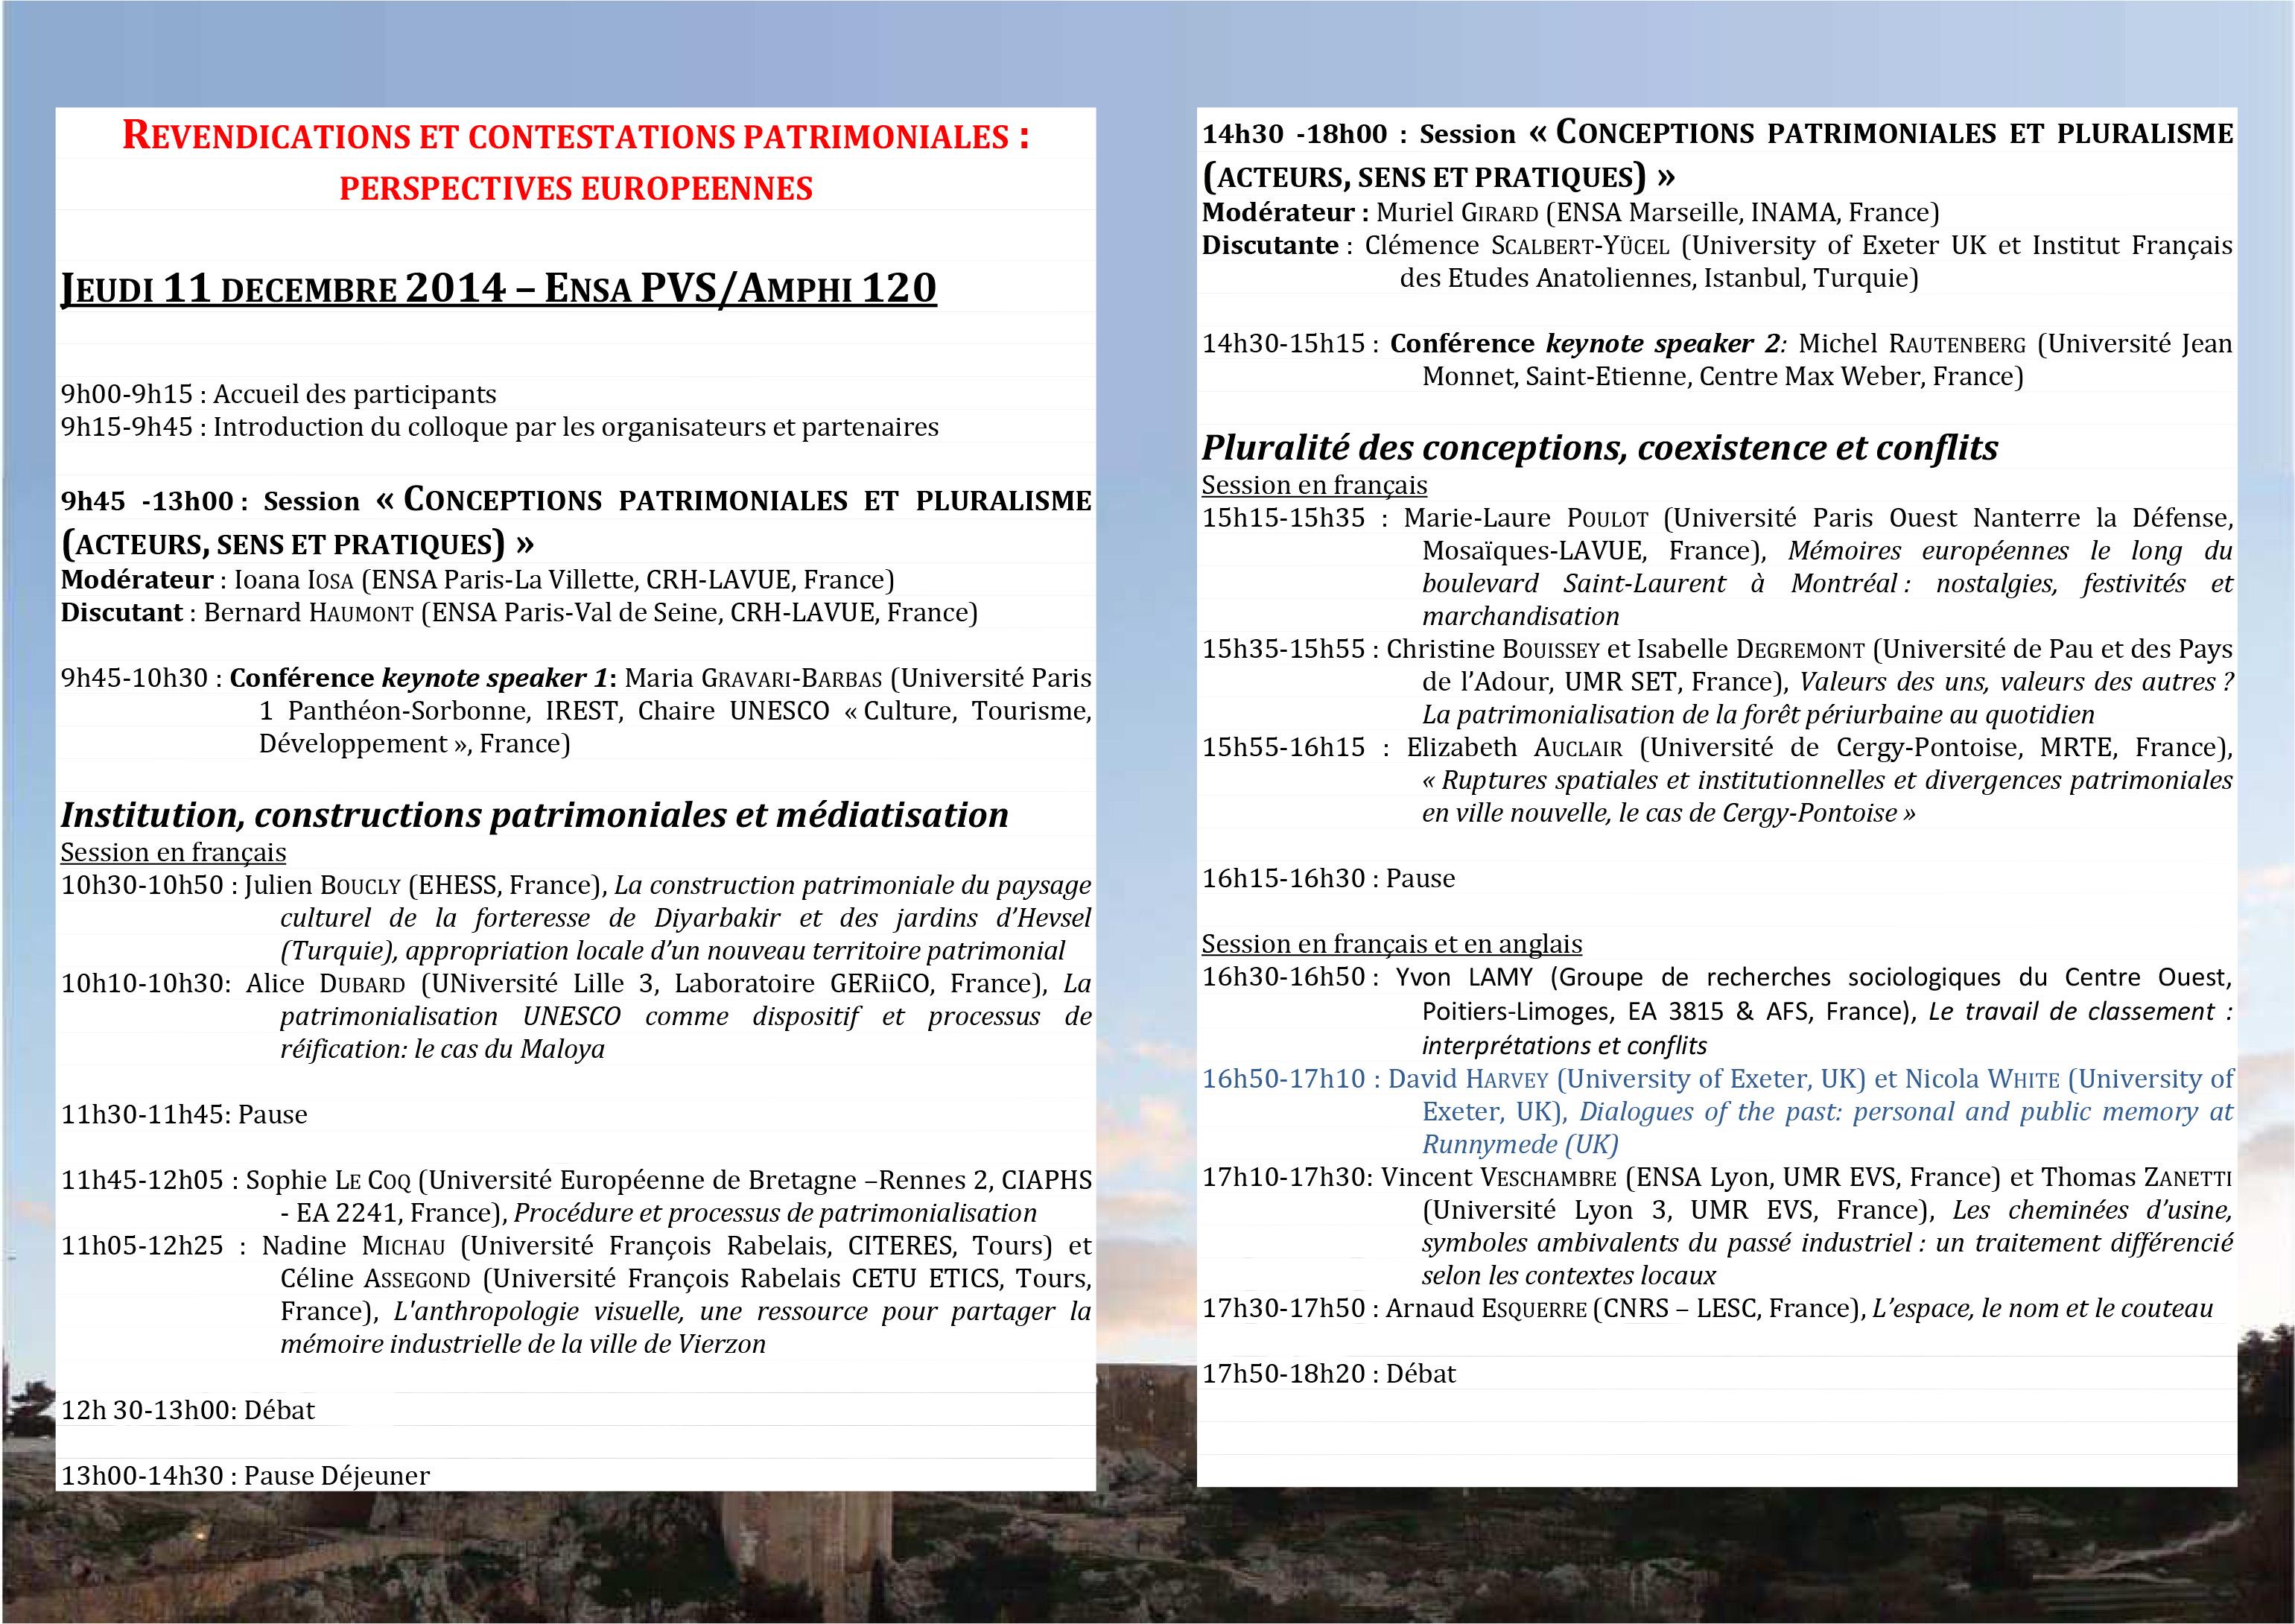 ProgrammeRCP25-11